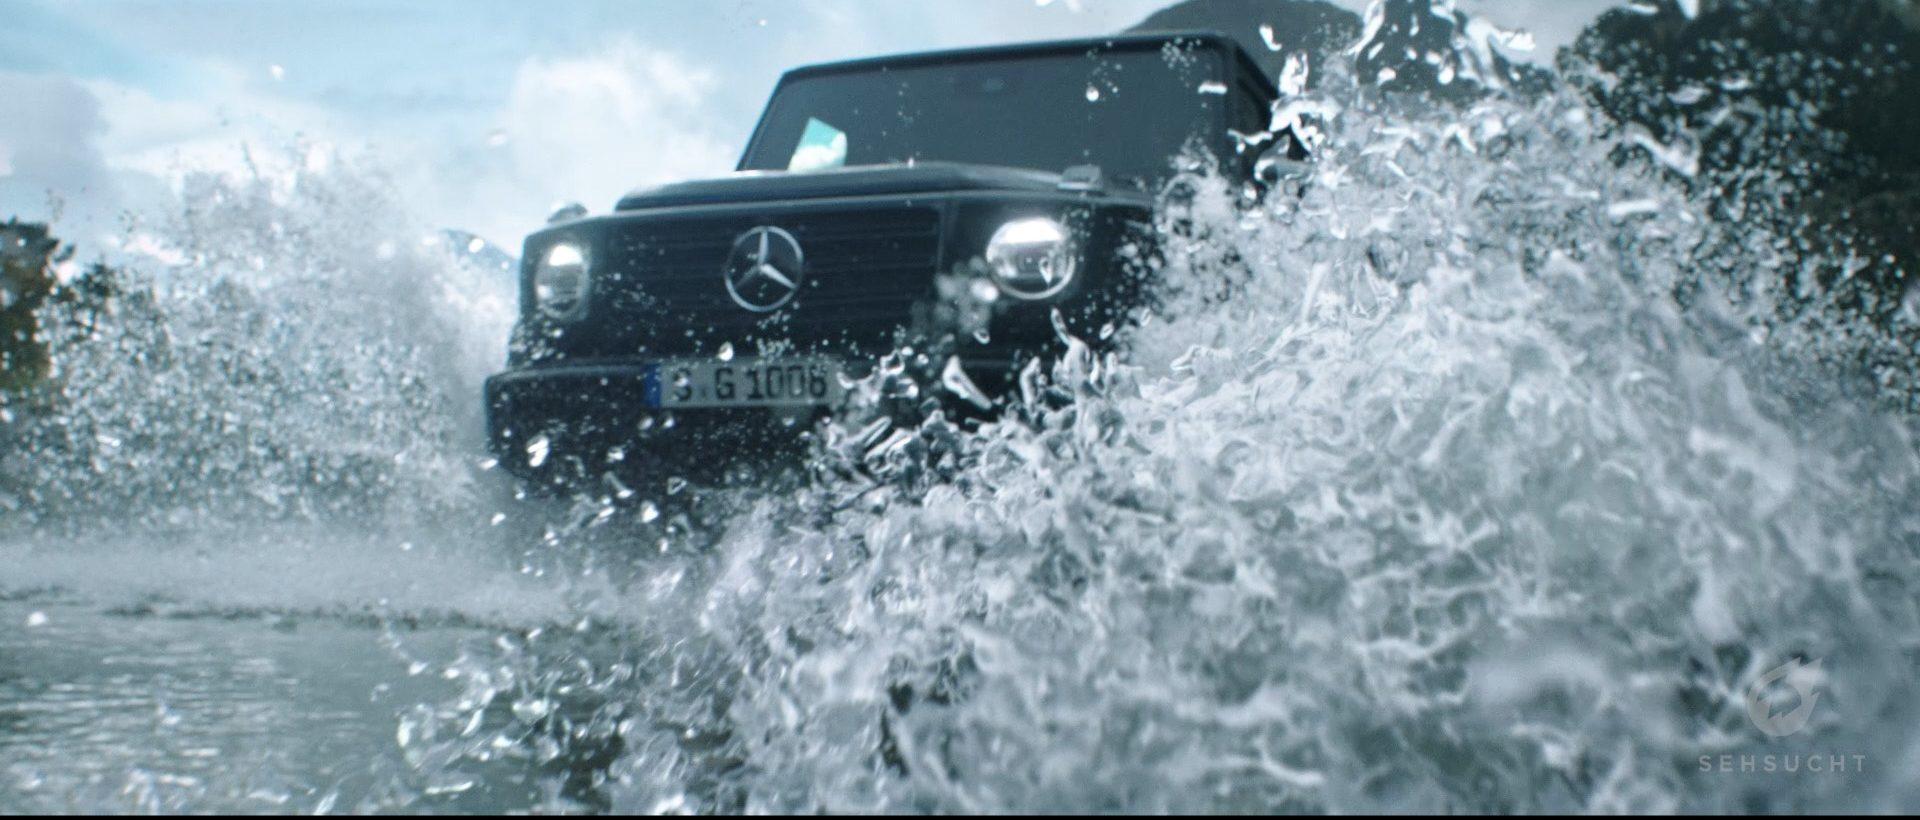 Mercedes Benz – Stronger Than Time